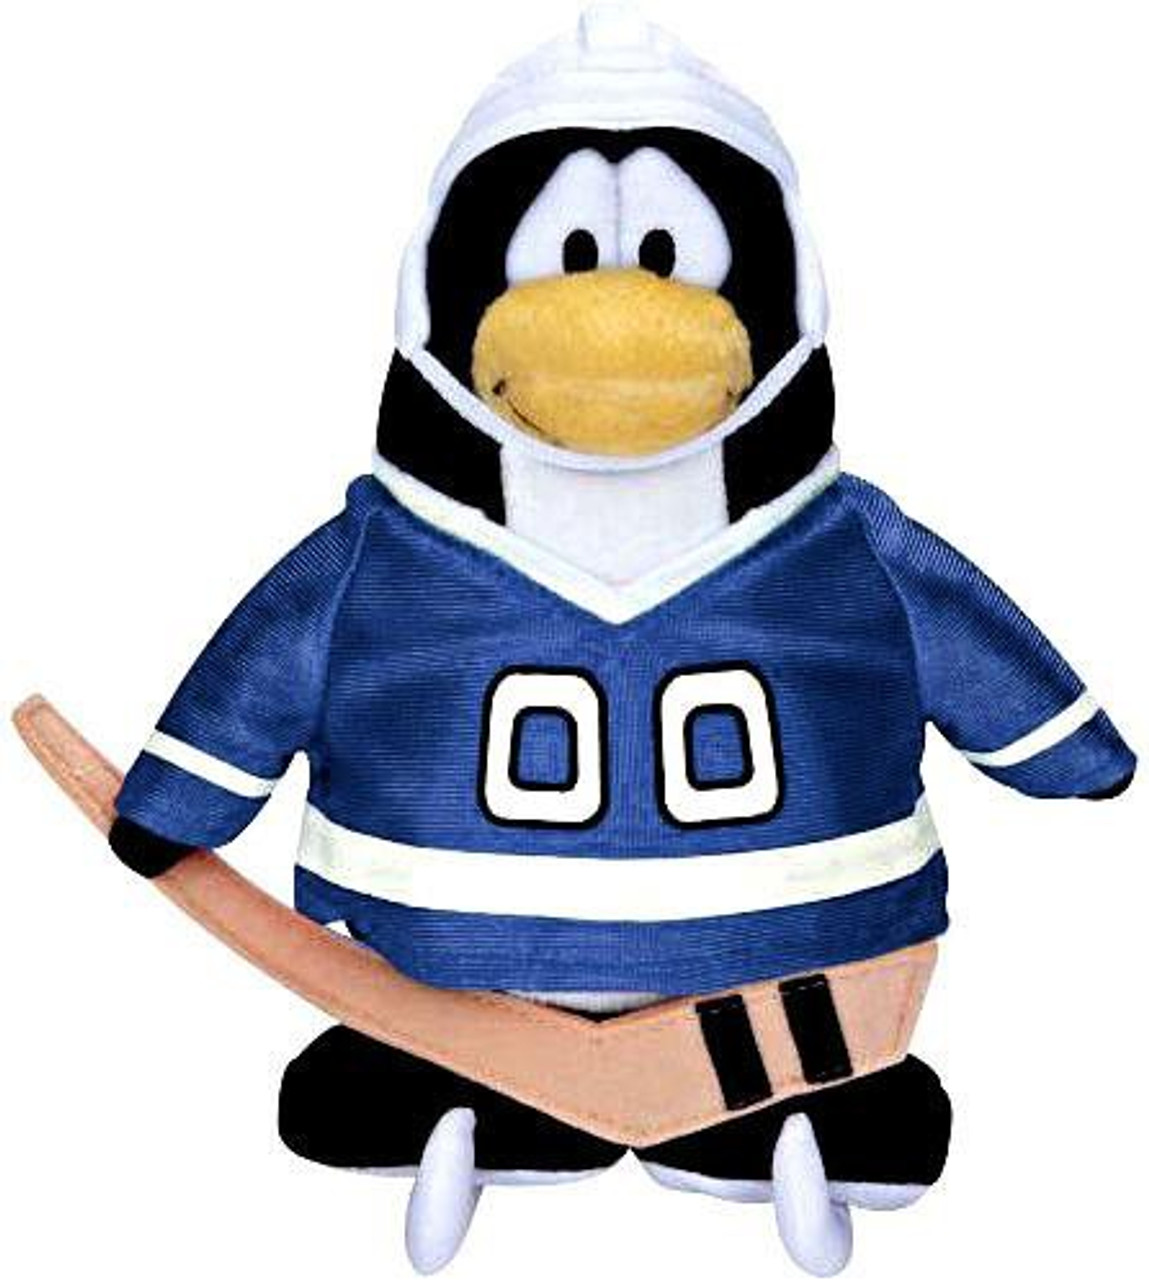 Club Penguin Series 11 Hockey Player 6.5-Inch Plush Figure [Blue Jersey]